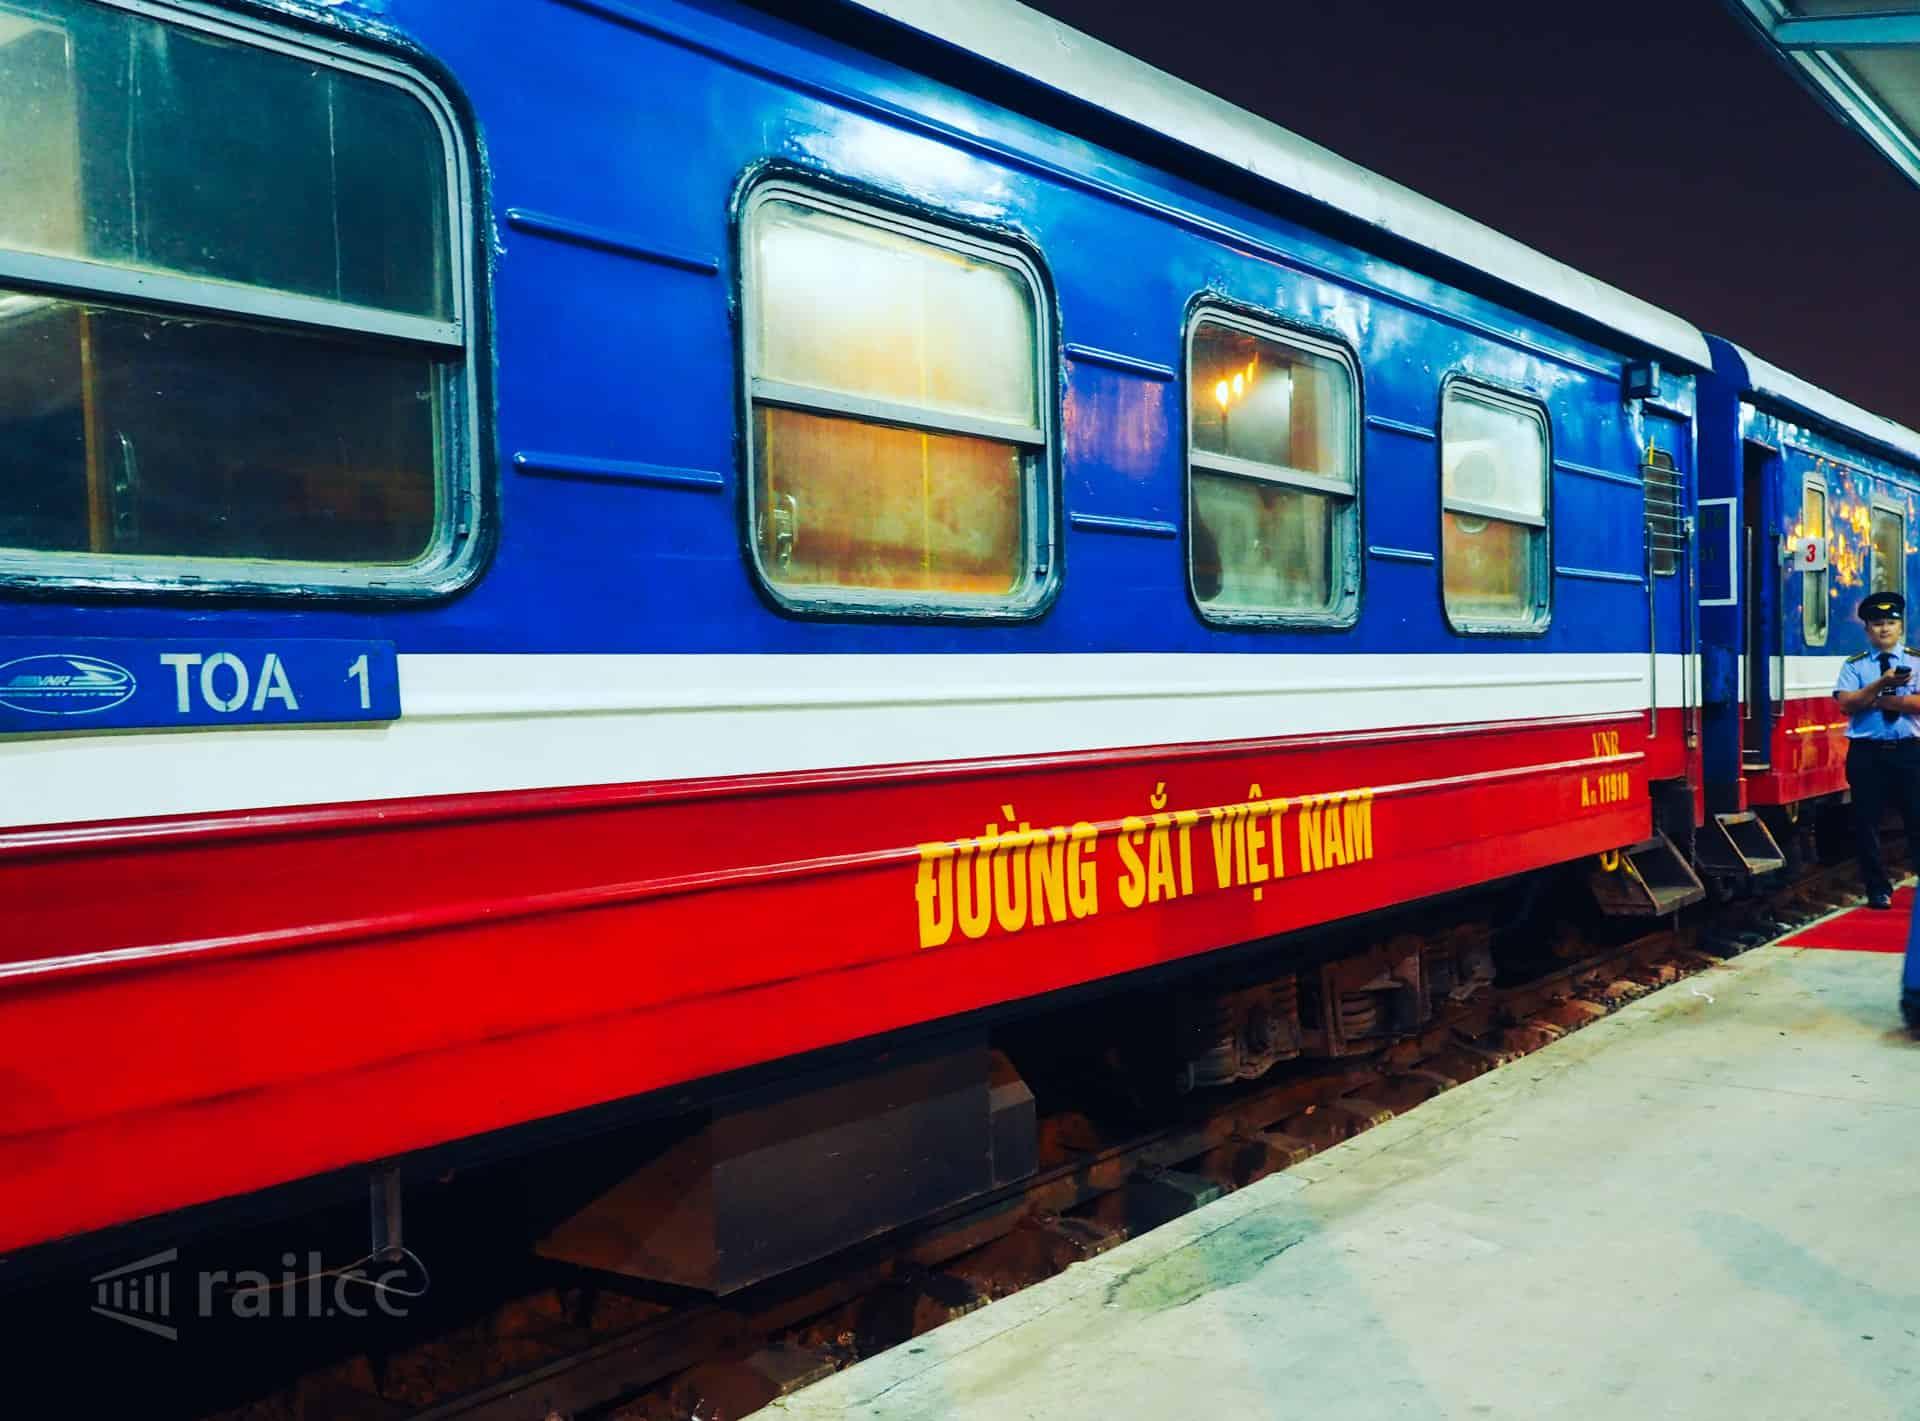 Day 6: Hanoi city tour -  Laocai (B/L) by train